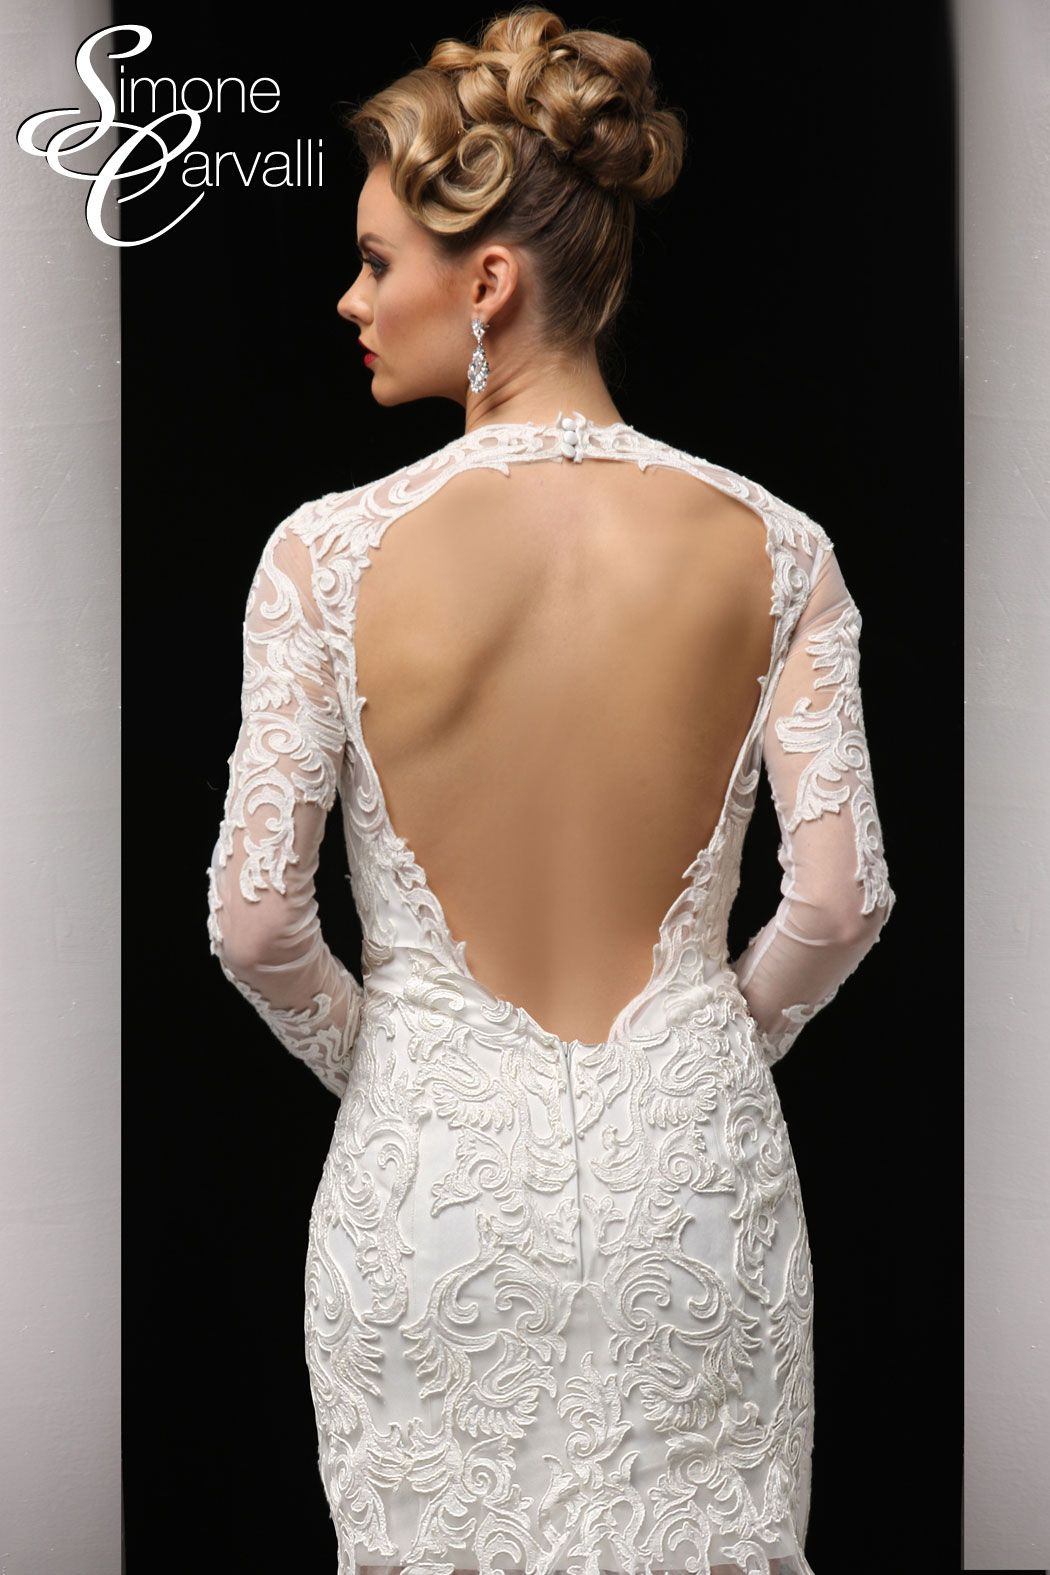 Simone Carvalli wedding gown - battenburg lace wedding dress with ...